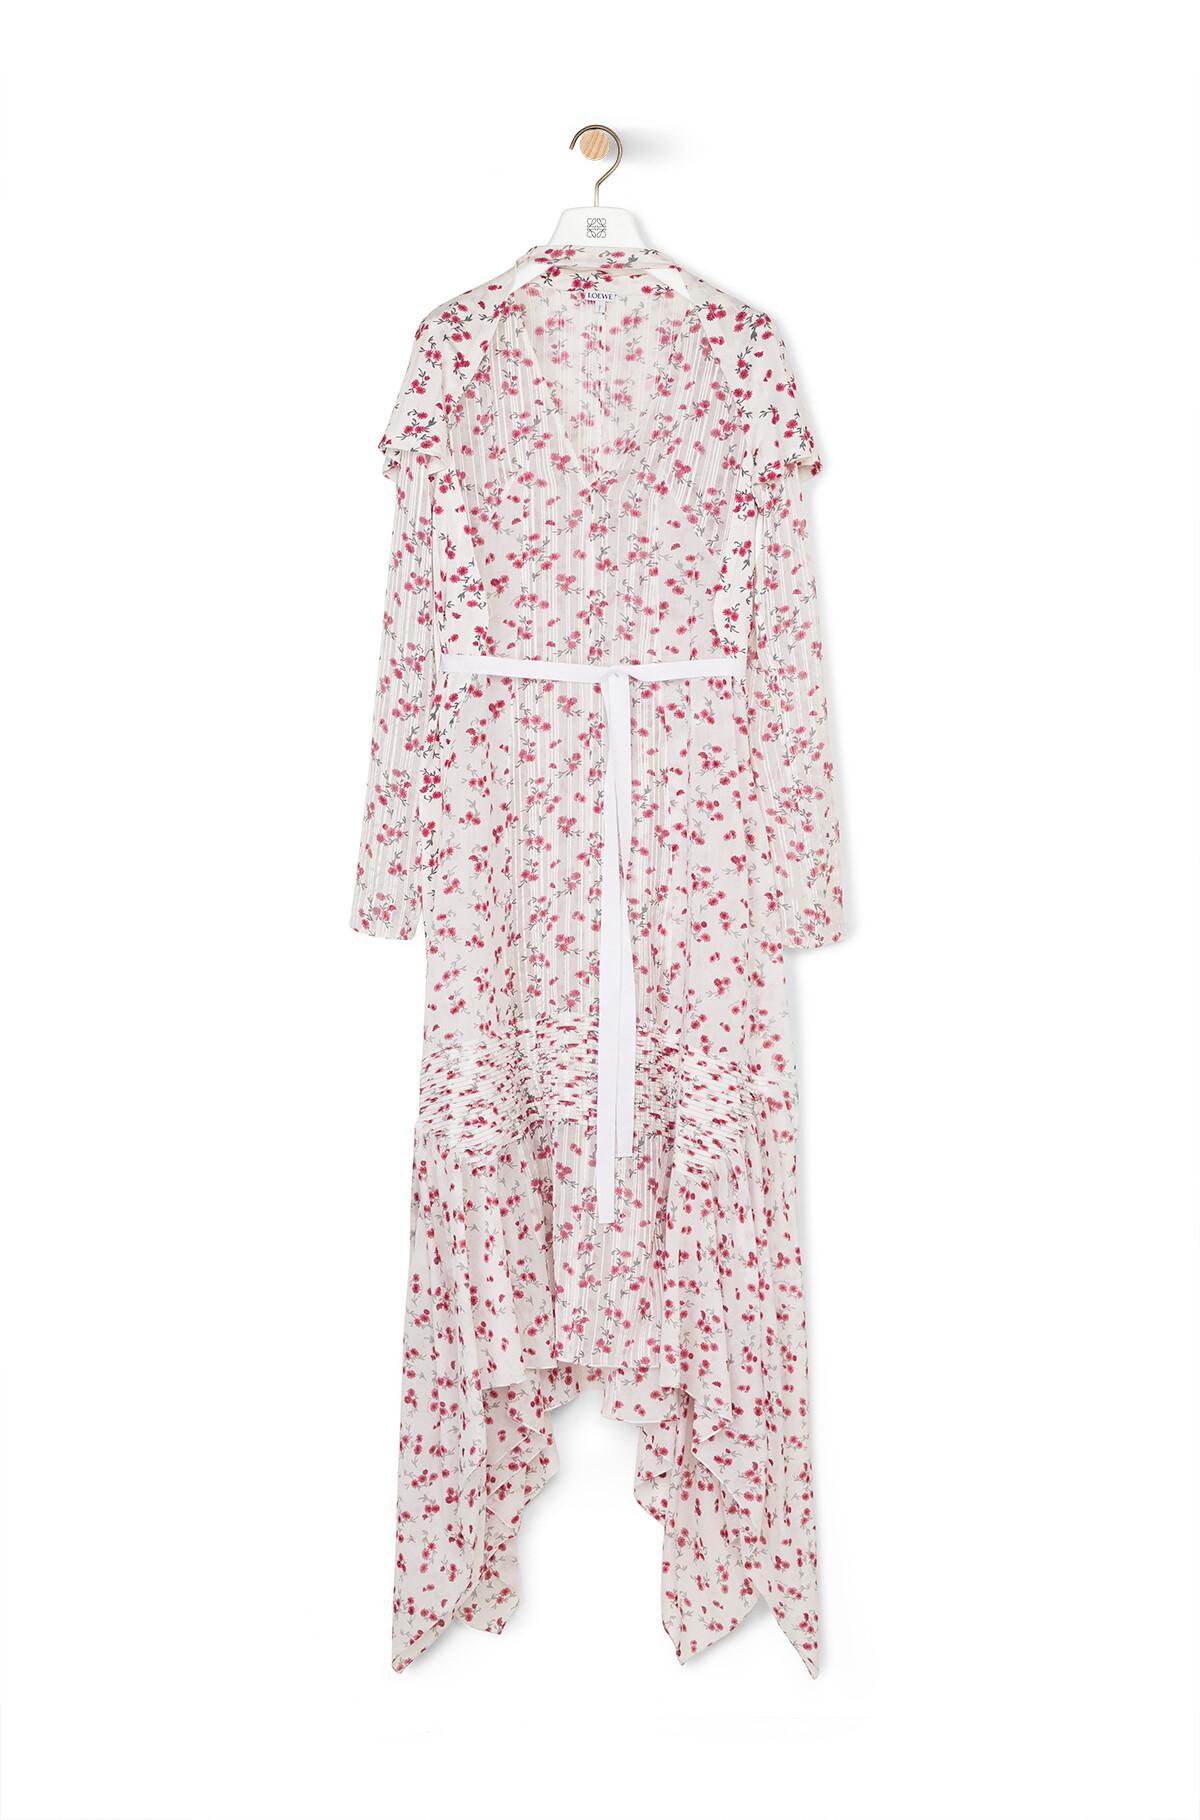 LOEWE Flower Print Dress White/Pink front